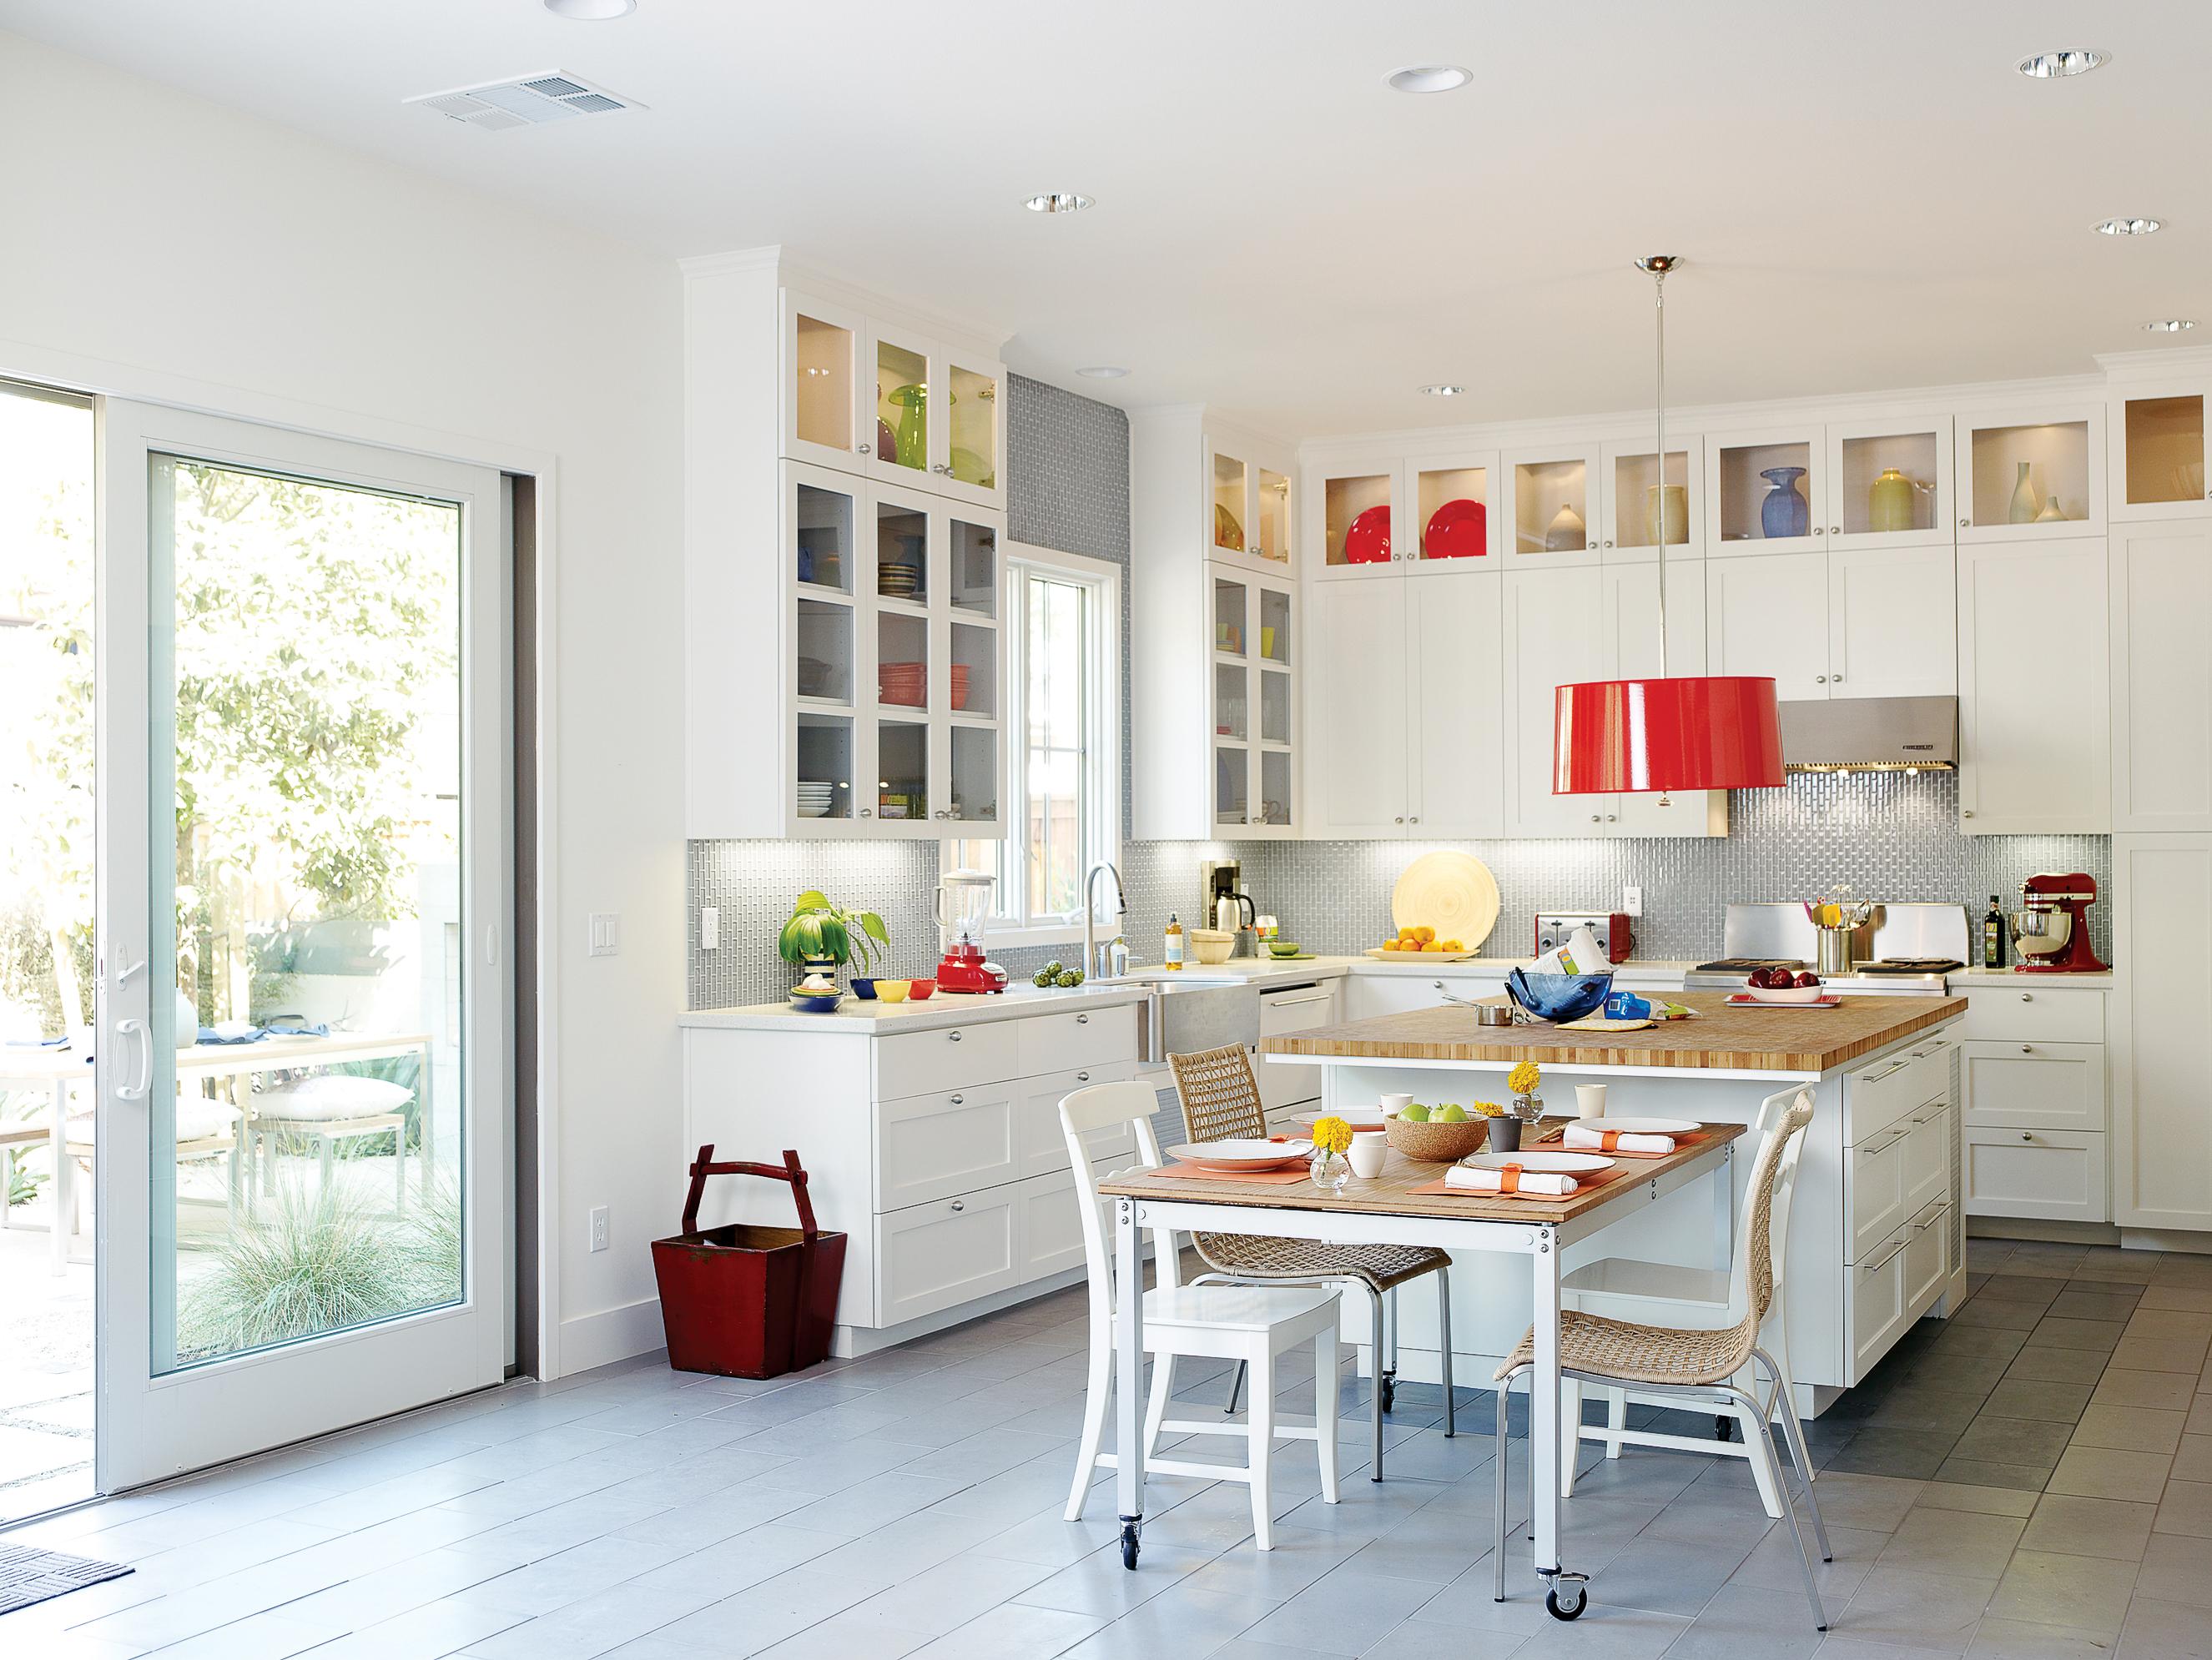 10 Sleek & Modern Decorating Ideas - Sunset Magazine